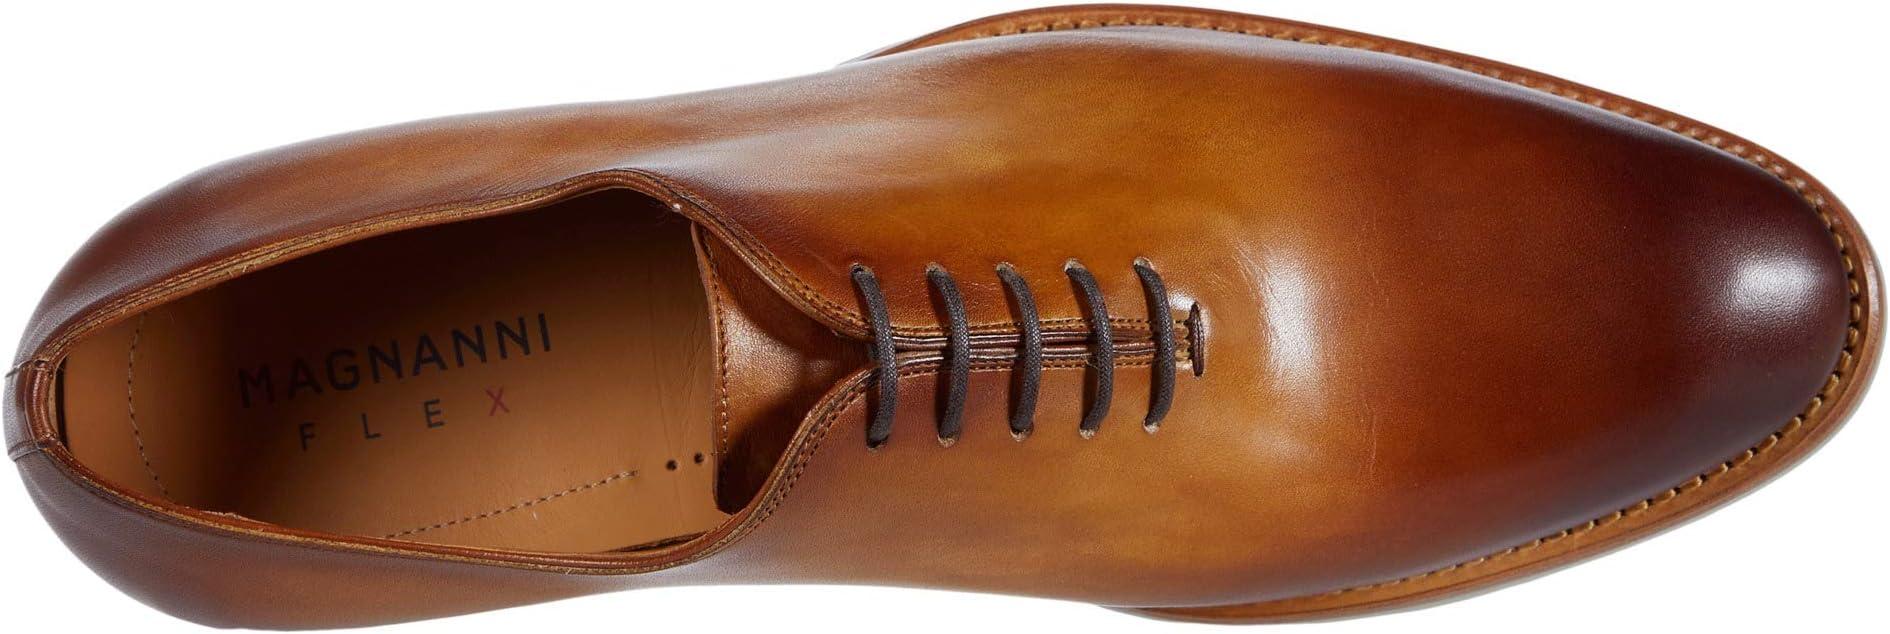 Magnanni Belago II   Men's shoes   2020 Newest